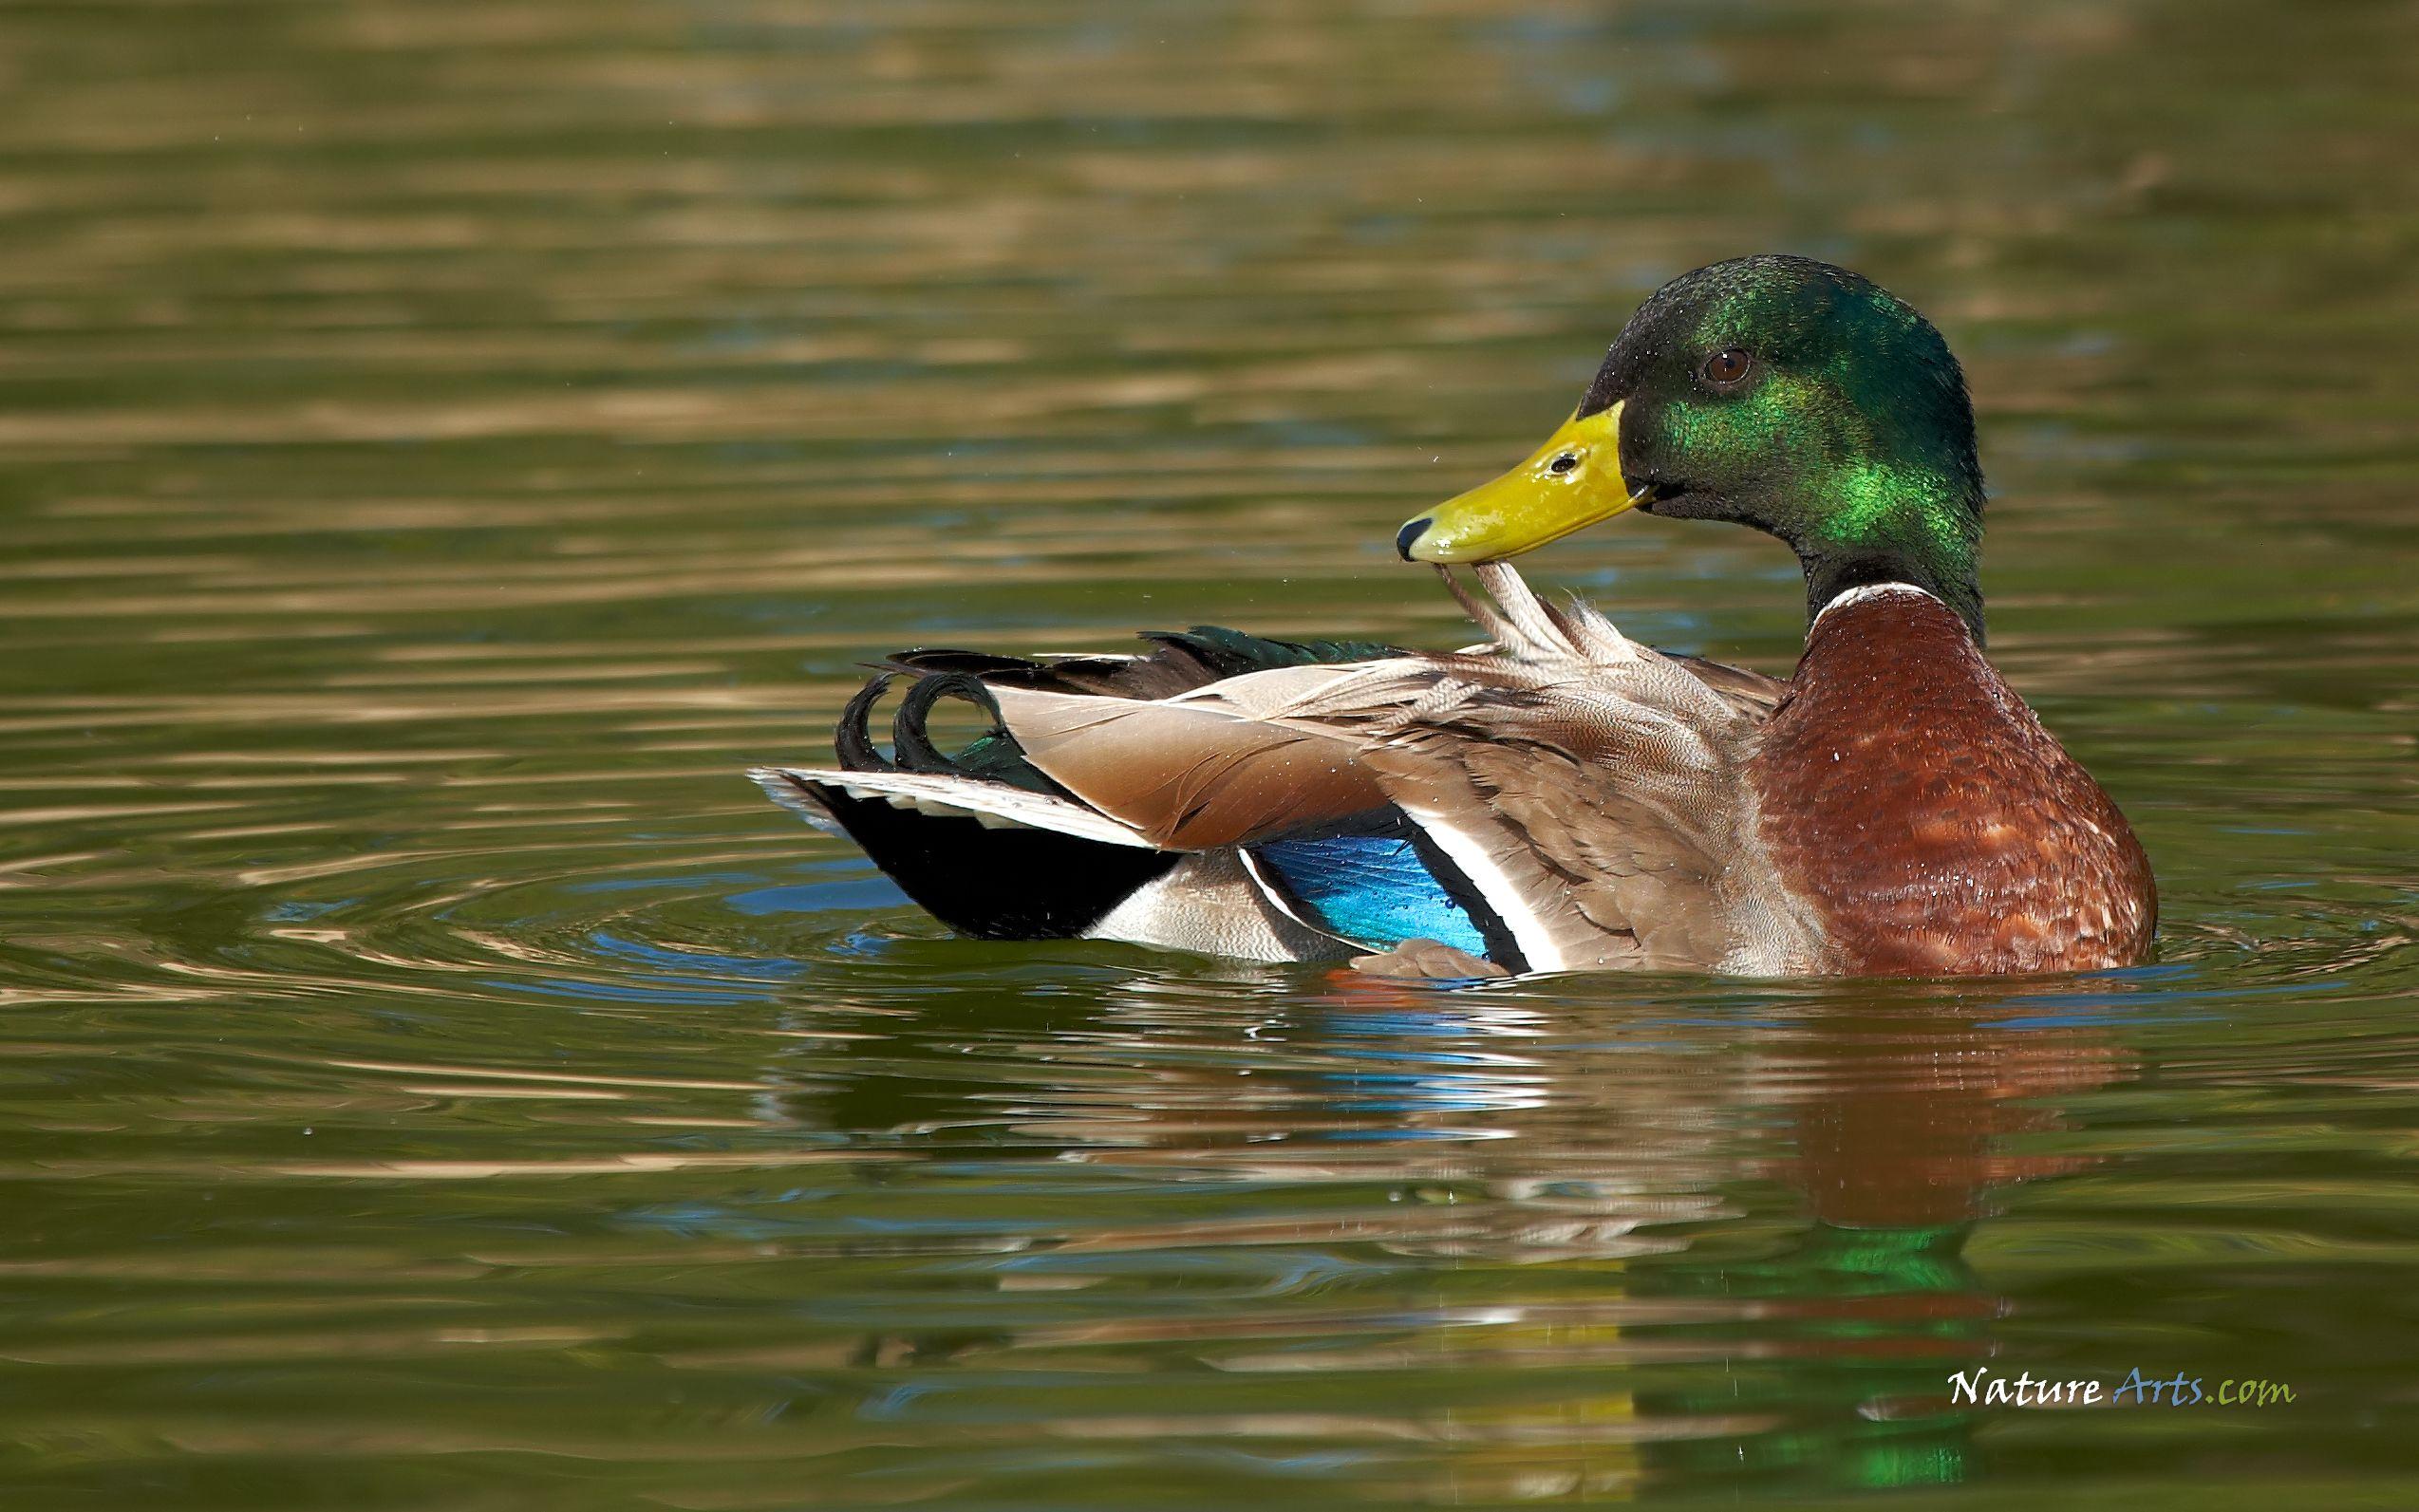 Http Naturearts Com Wallpaper Images Mallard Duck Jpg Duck Wallpaper Wildlife Wallpaper Mallard Duck